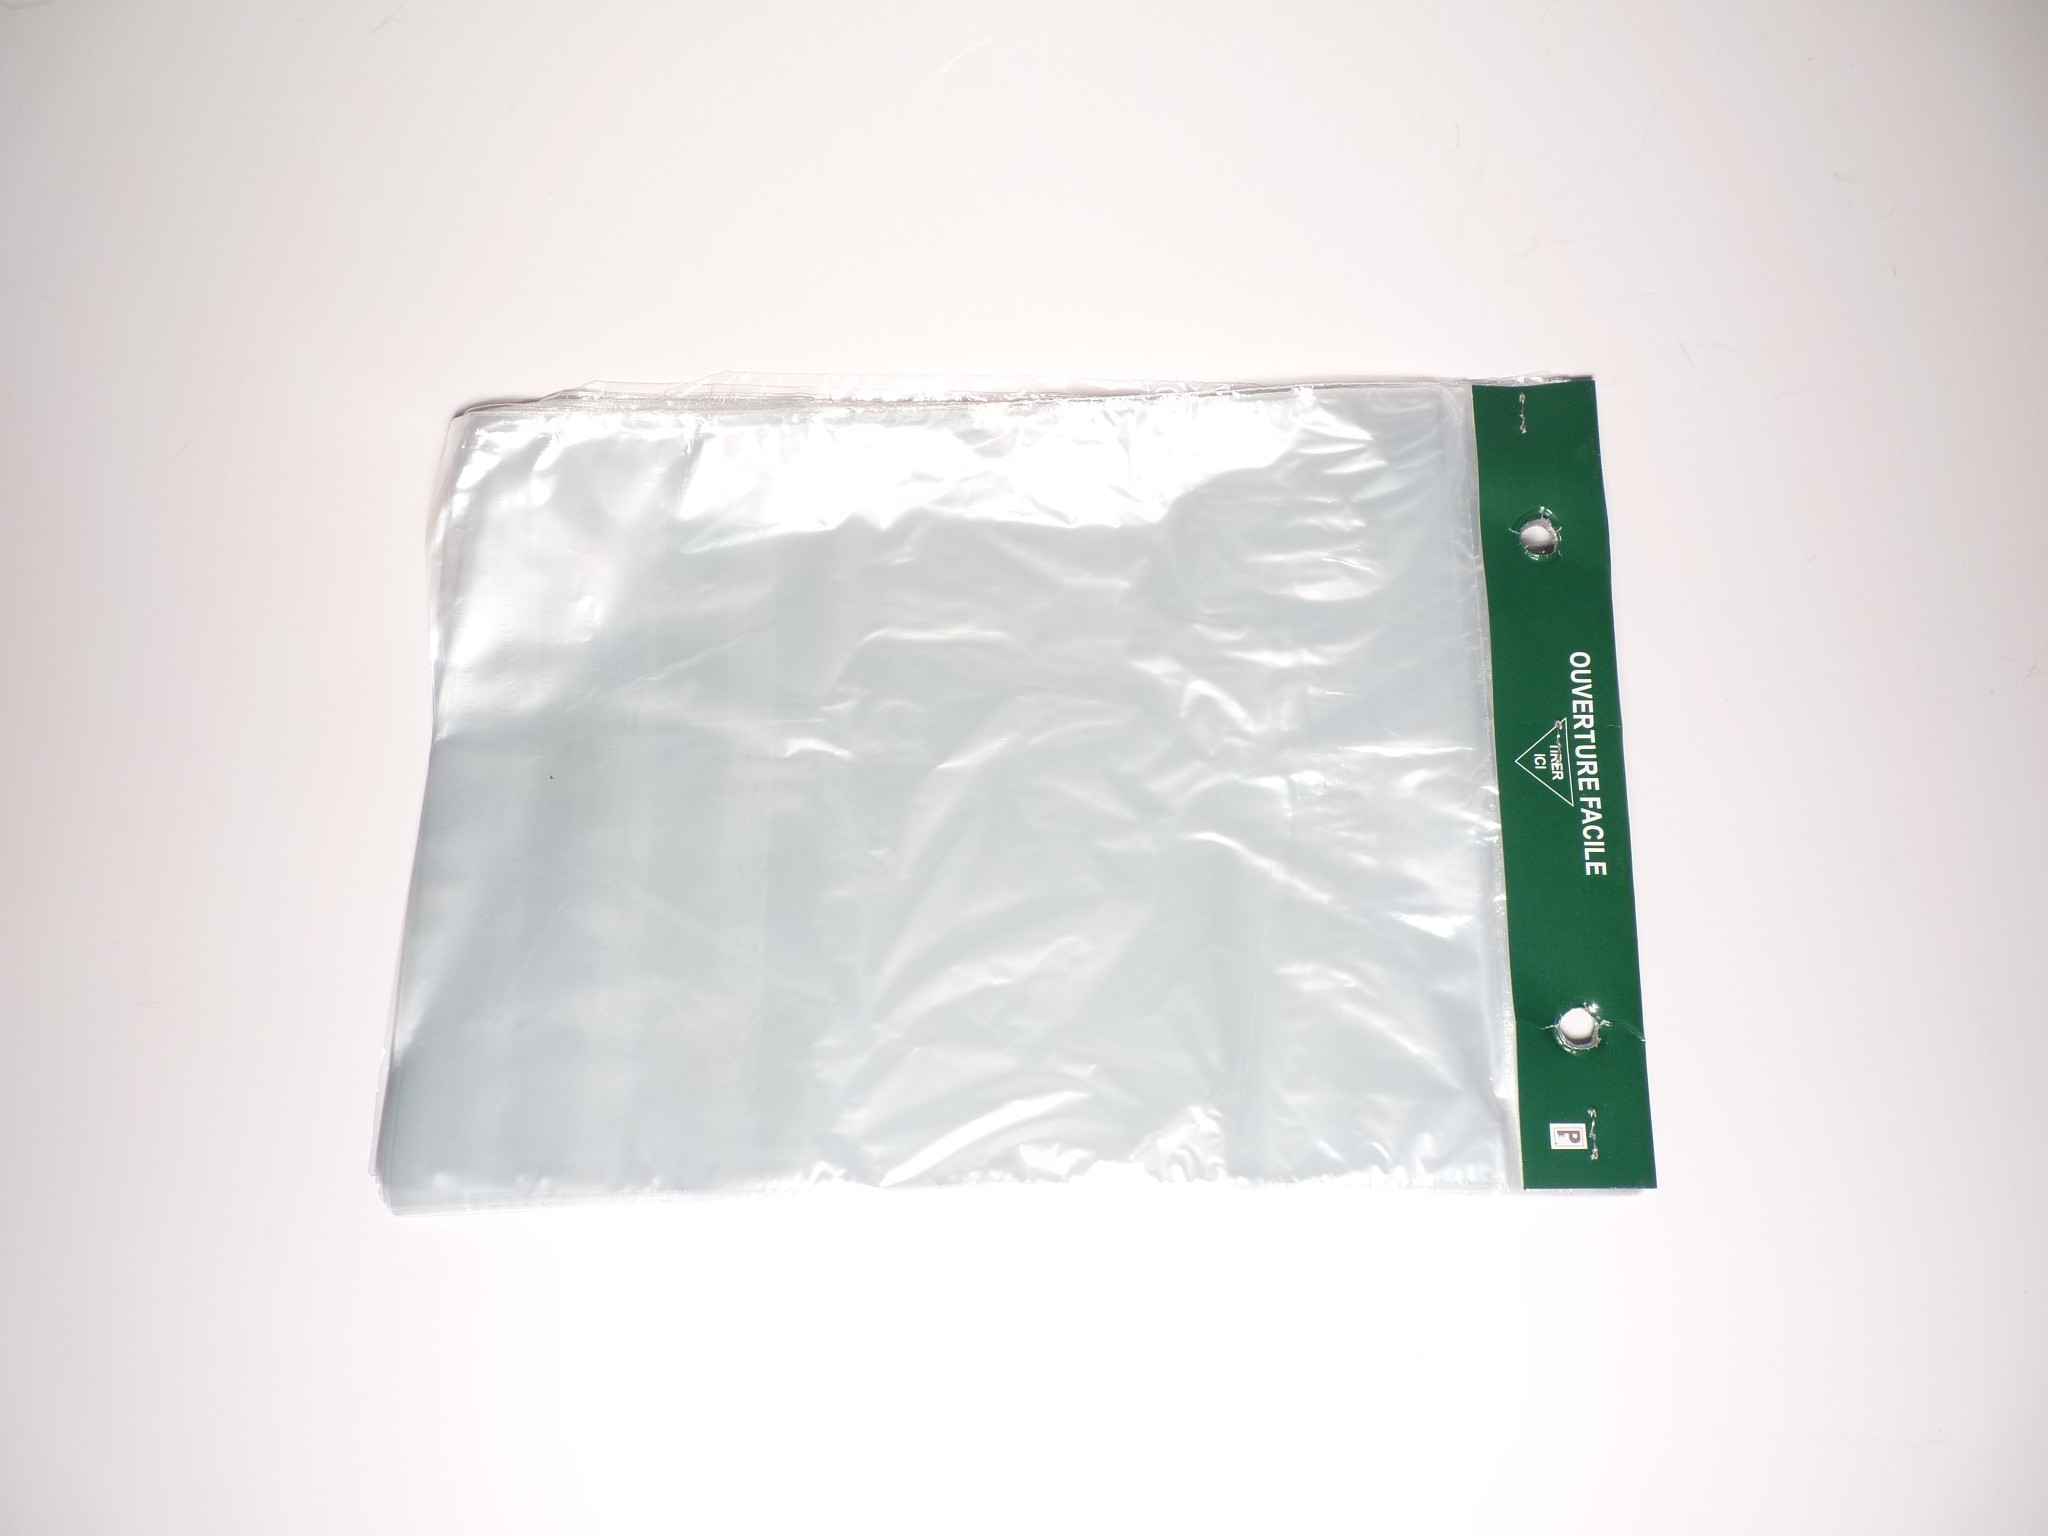 sac plastique transparent sachet plastique transparent with sac plastique transparent. Black Bedroom Furniture Sets. Home Design Ideas